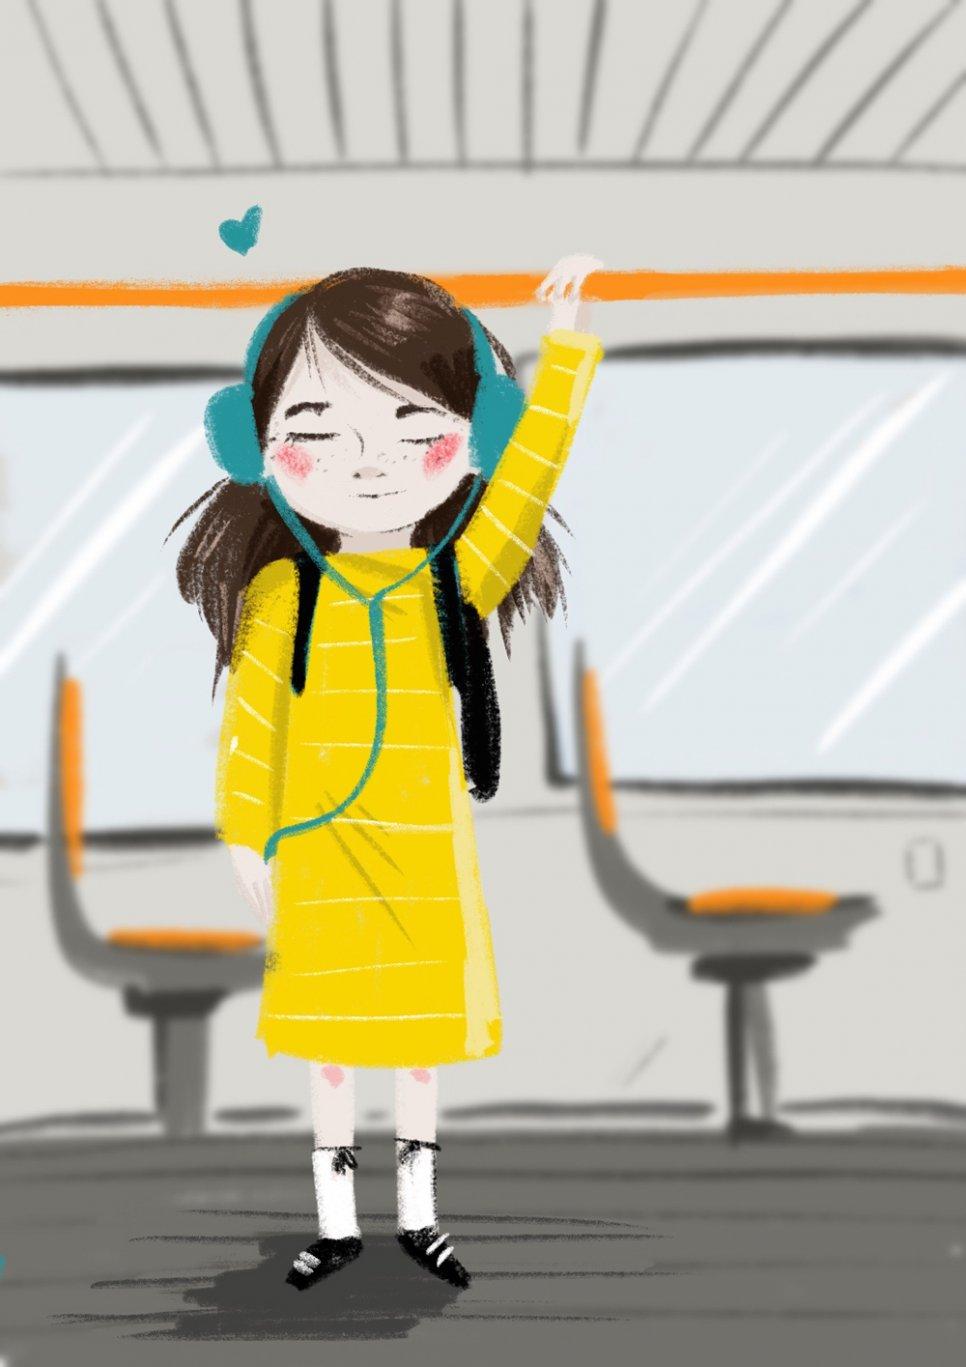 Autorkou ilustrace je lusym.com